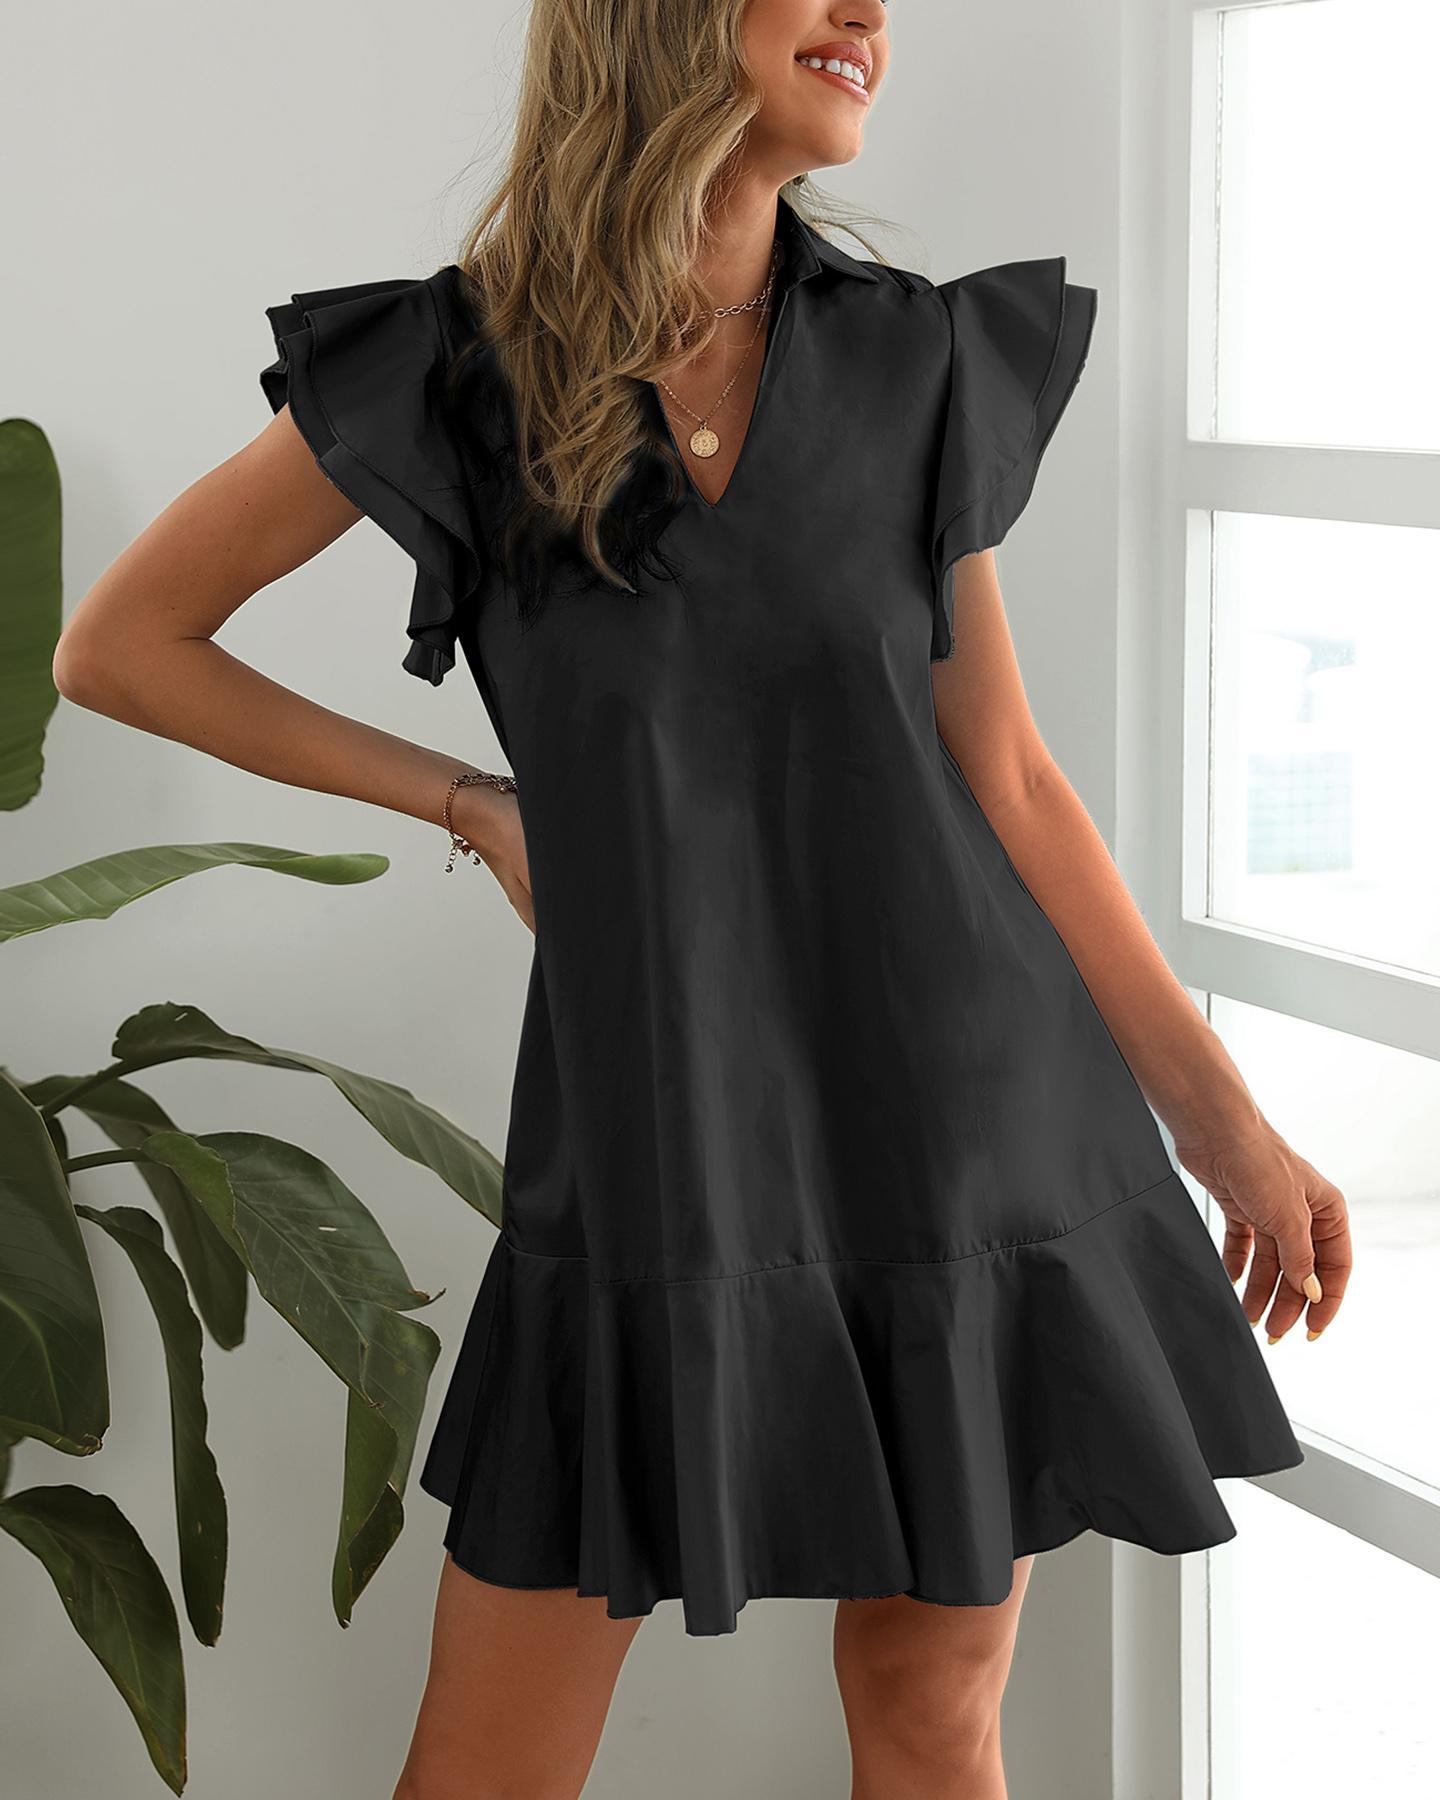 Flutter Sleeve Ruffle Trim Pockets Casual Dress фото